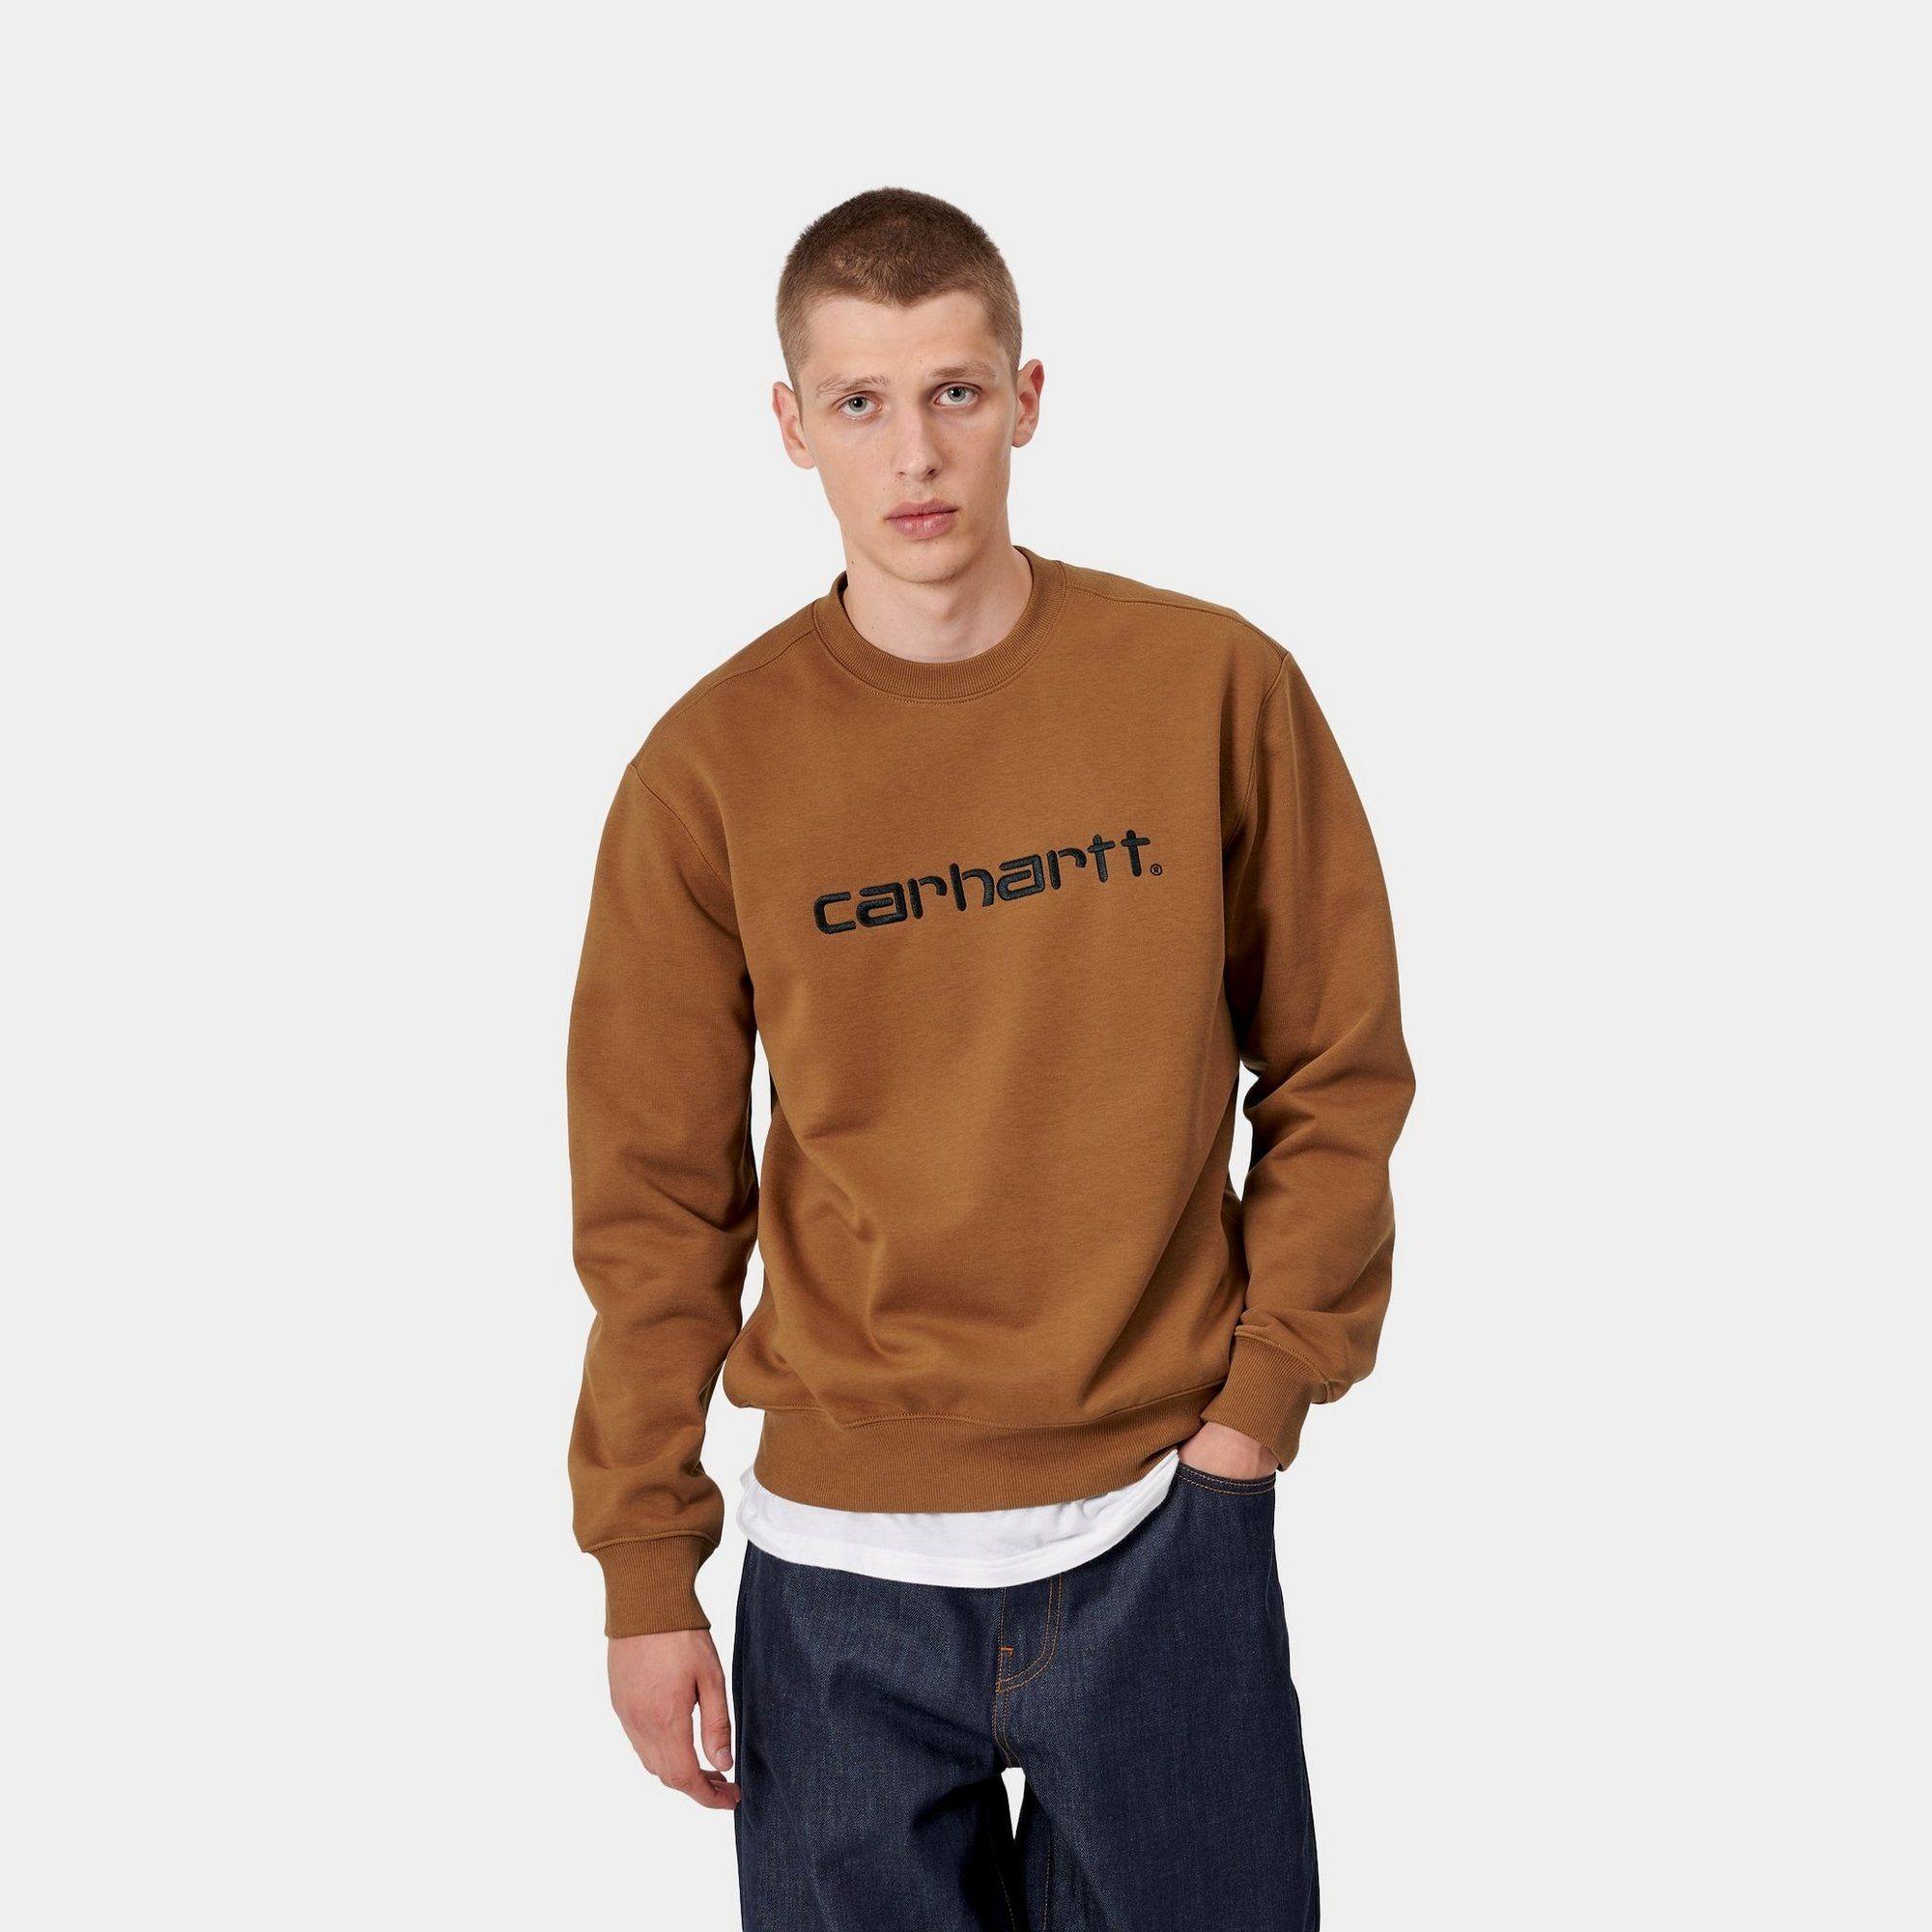 Carhartt Wip Carhartt Sweatshirt Hamilton Brown Carhartt Wip Usa Carhartt Sweatshirts Sweatshirts Carhartt [ 2000 x 2000 Pixel ]